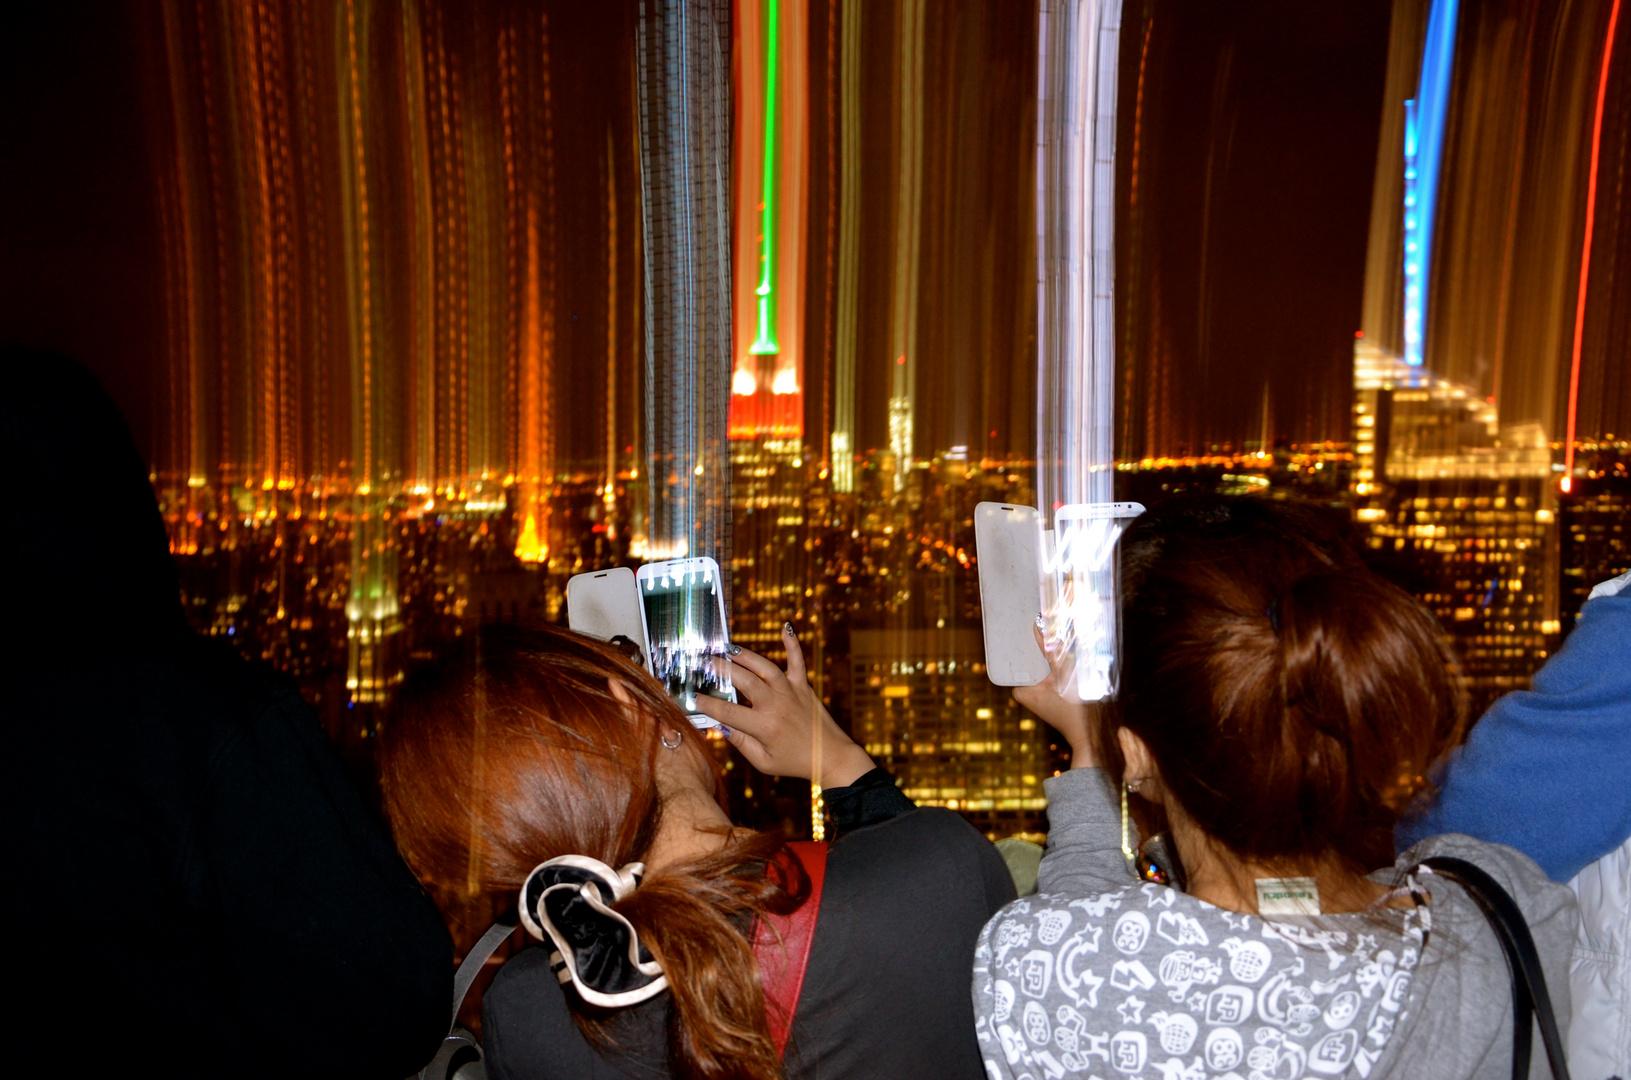 Fotos machen Rockefeller Center New York